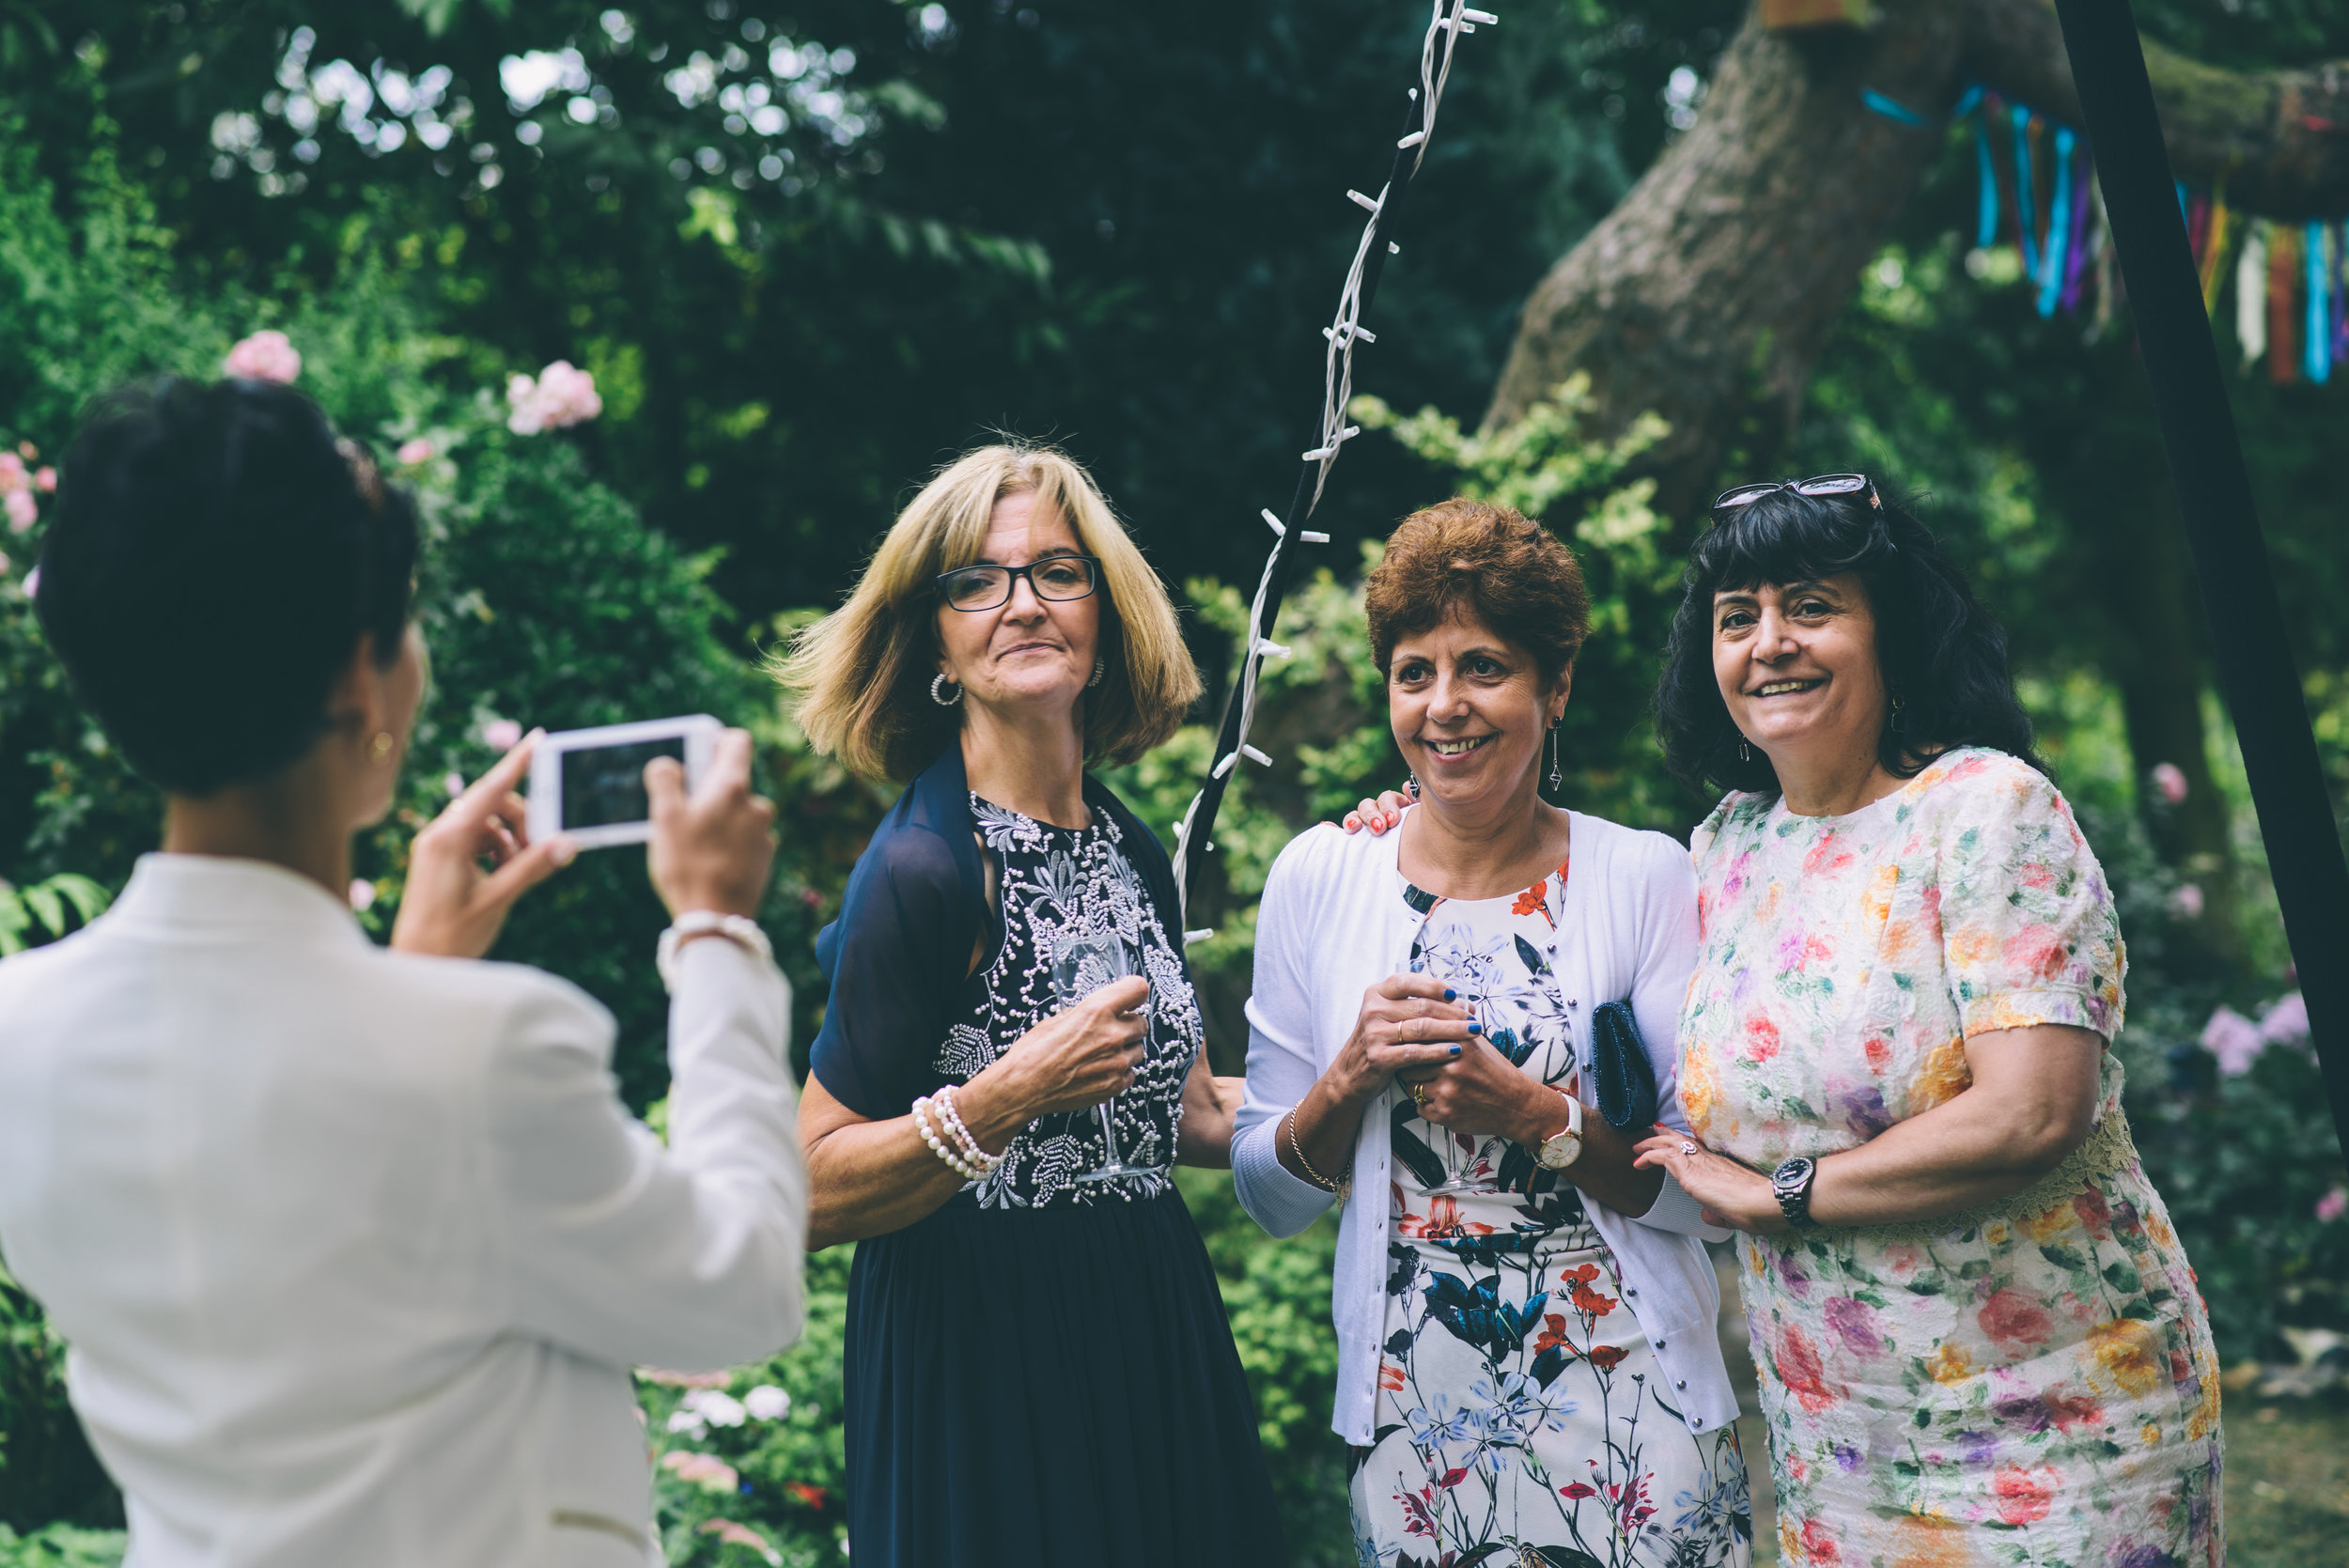 Garden Wedding photography Barley Herefordshire - Tracy + Matt -225.jpg